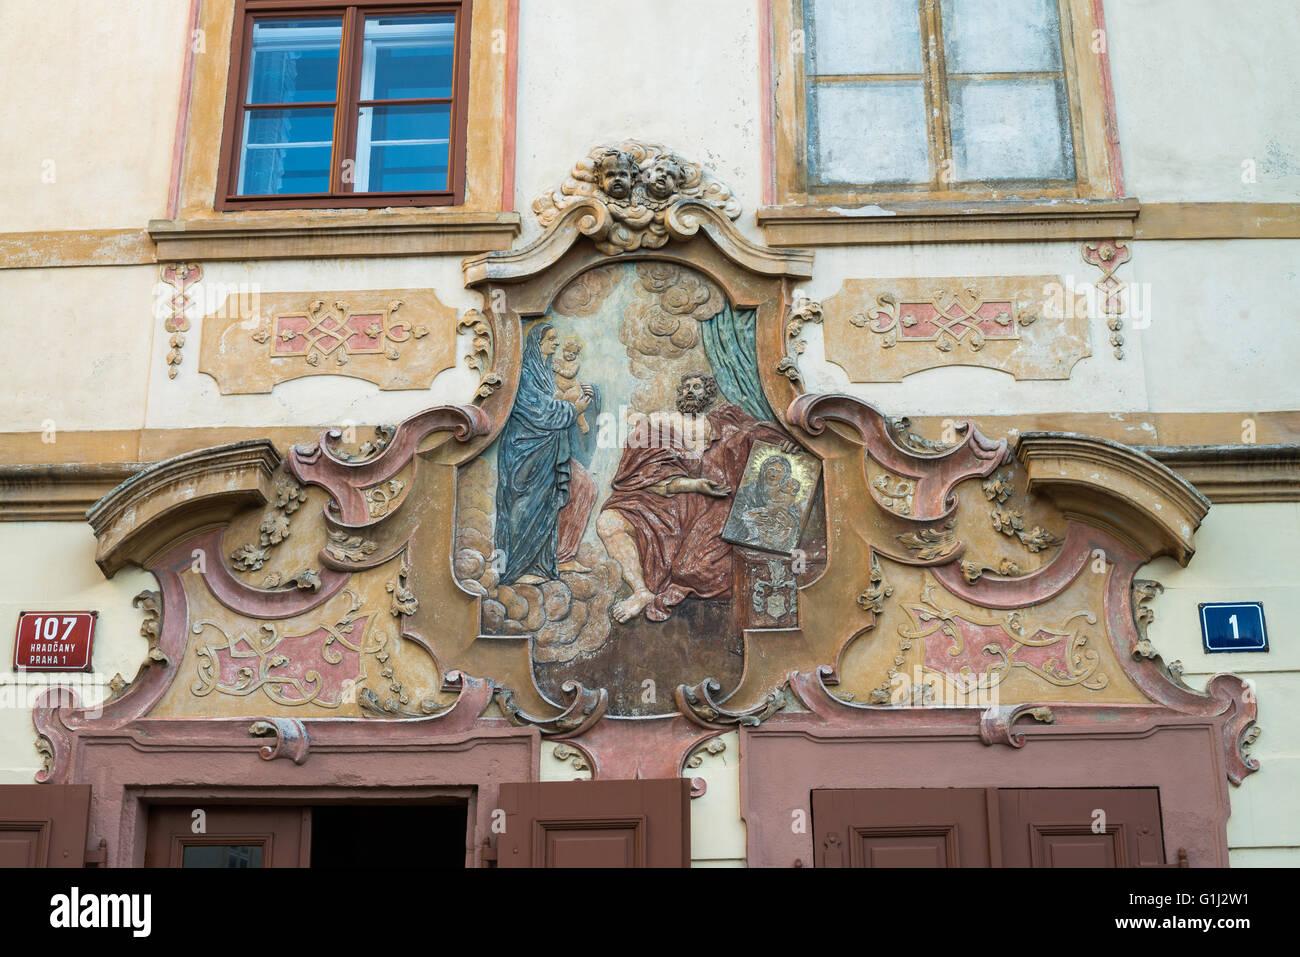 Fresco on wall of U Cerneho Vola (The Black Ox) at Loretanska street, Prague, Czech Republic, Europe - Stock Image